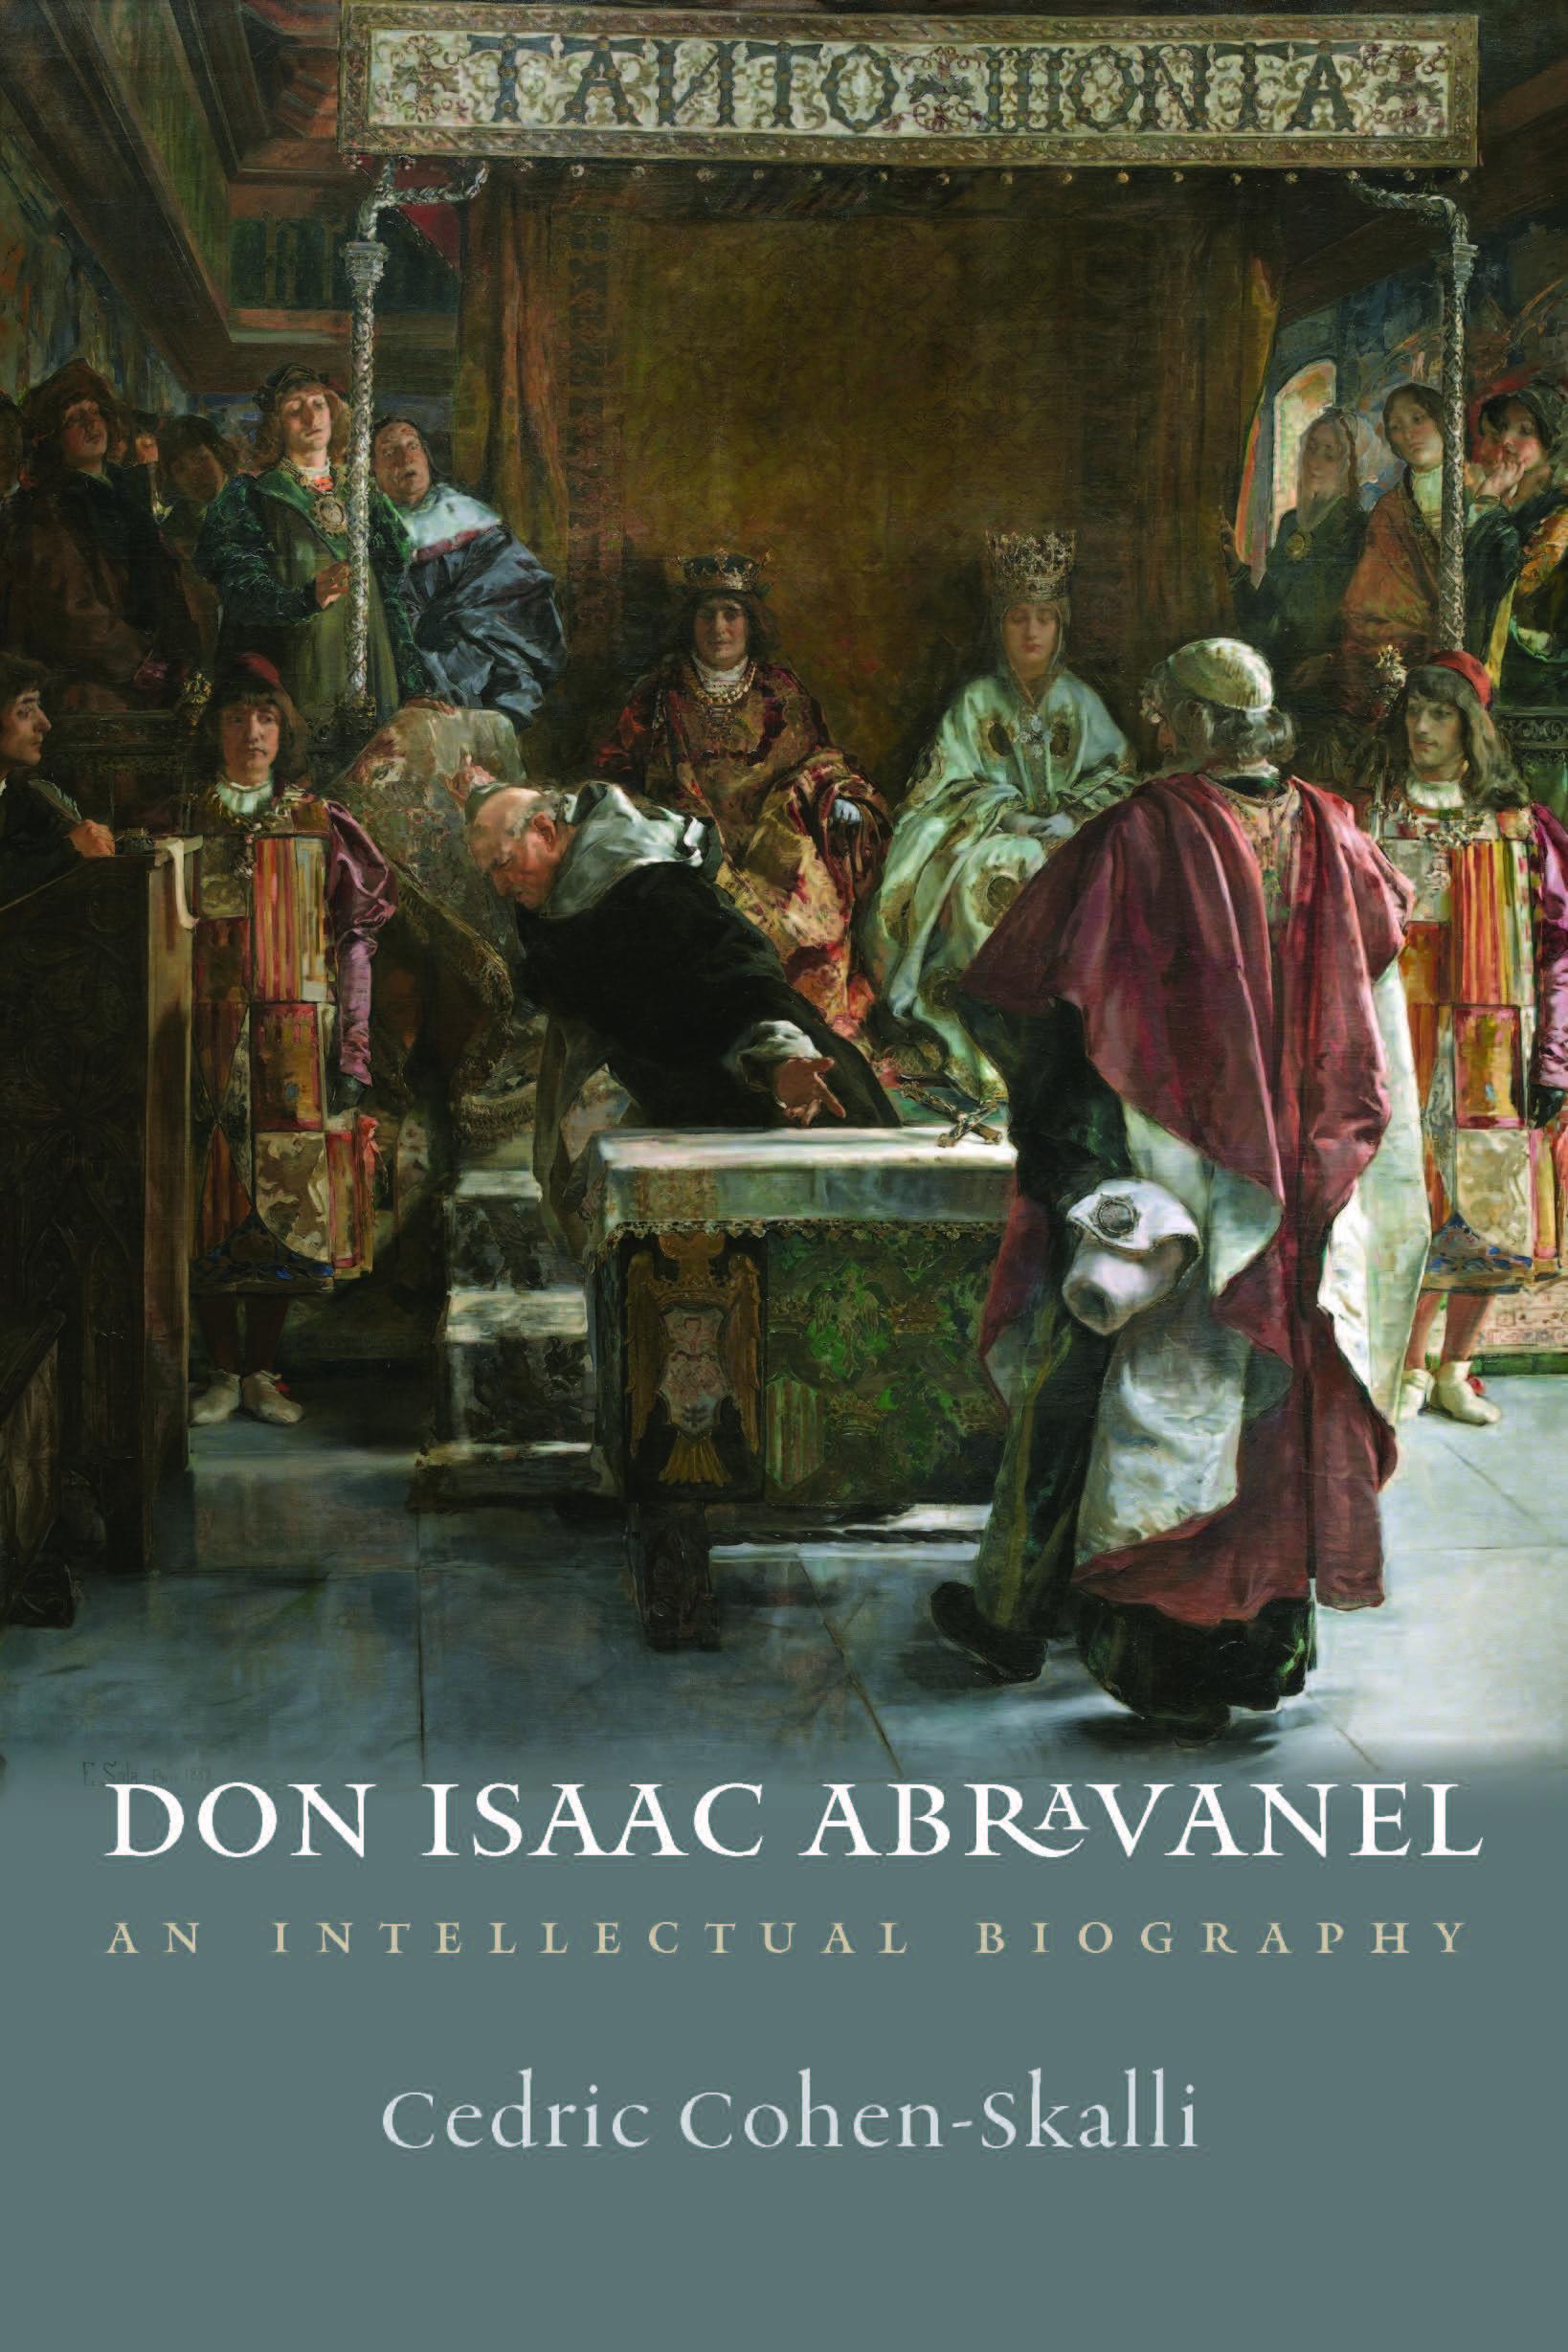 Don Isaac Abravanel: An Intellectual Biography